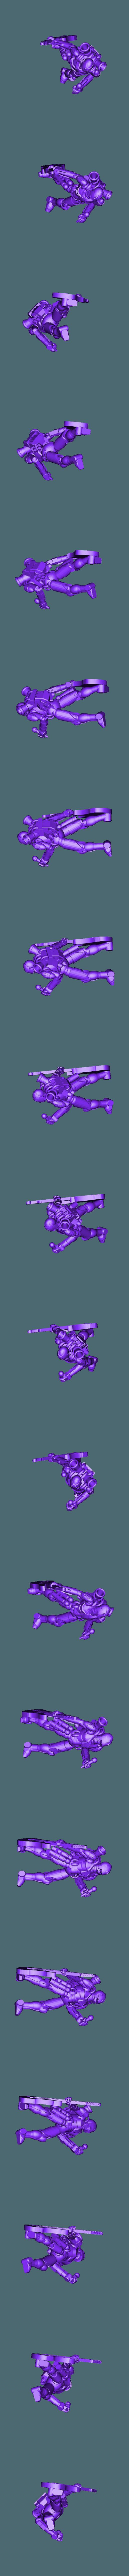 Bard_Bot.stl Download free STL file Bard Bot • 3D printing model, mrhers2